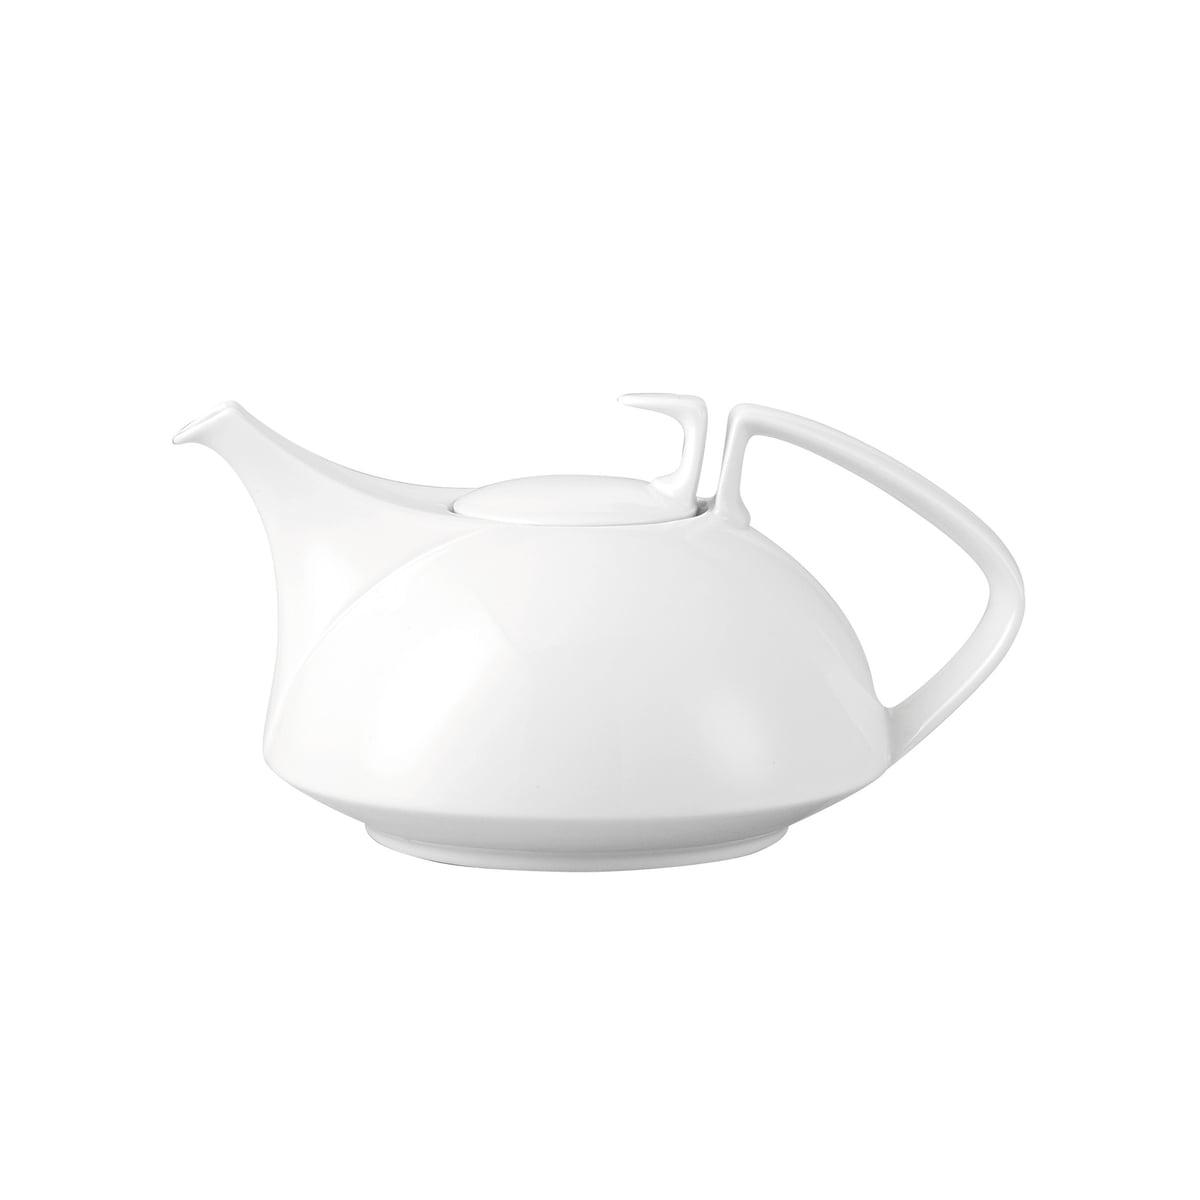 Rosenthal tac teekanne klein weiss